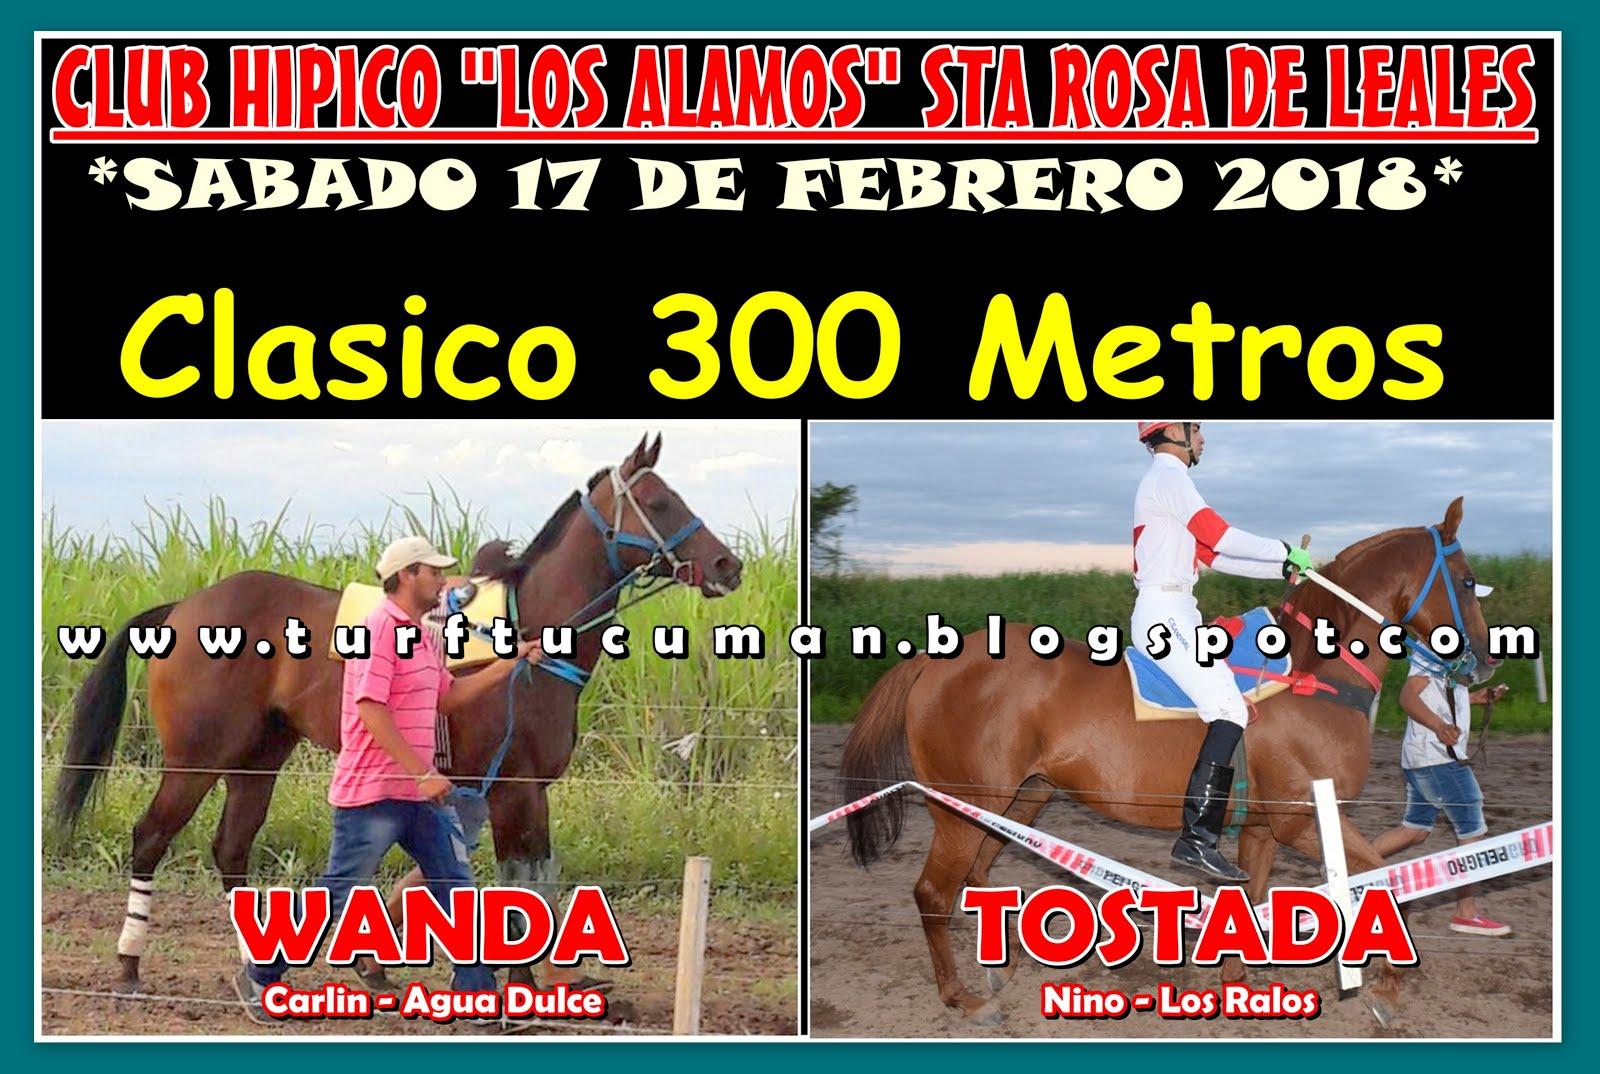 WANDA VS TOSTADA